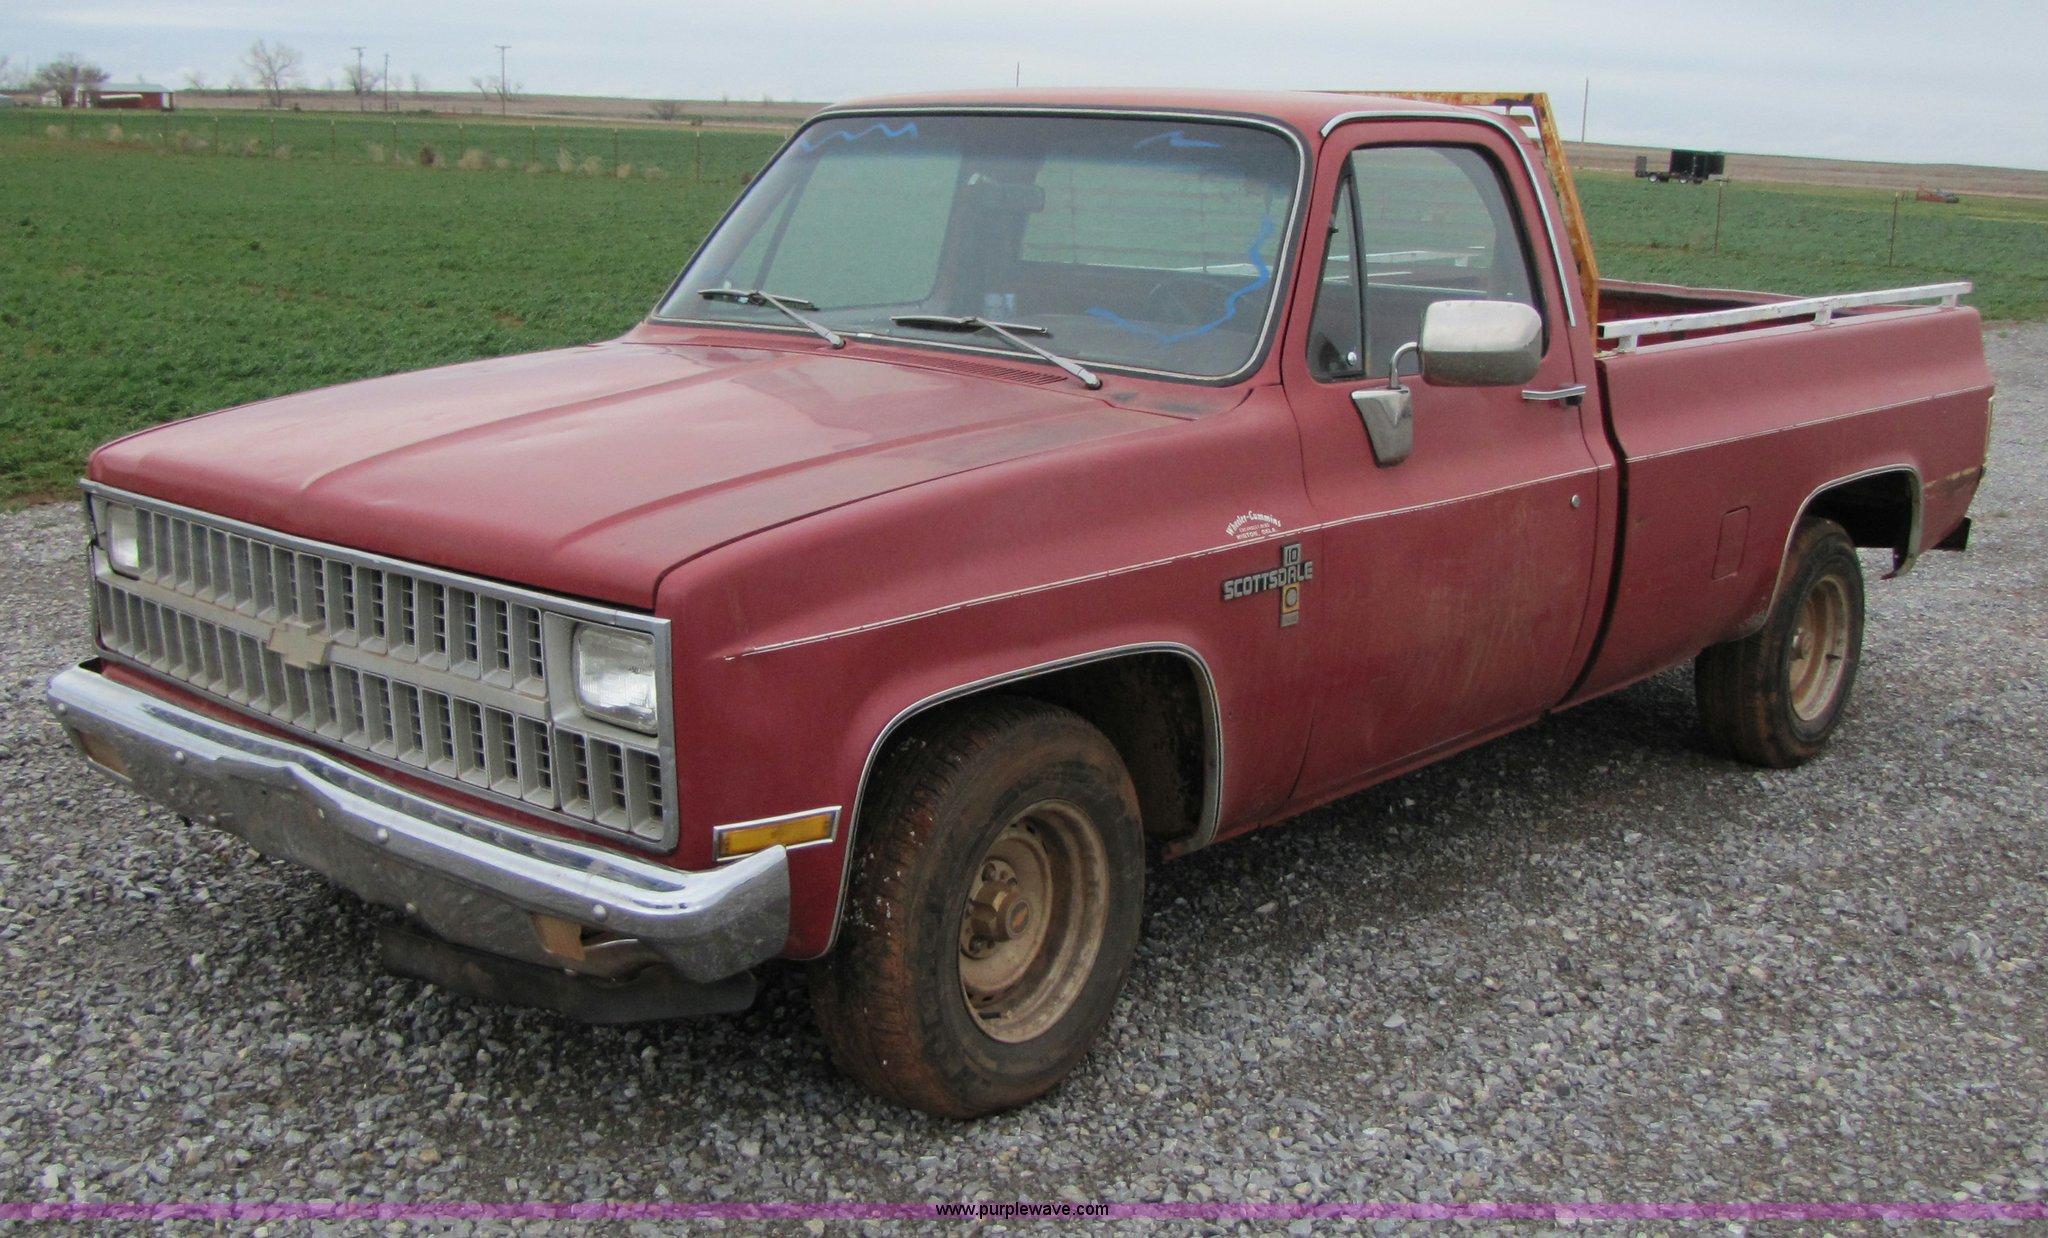 1982 Chevrolet Scottsdale C10 Pickup Truck Item B2260 So